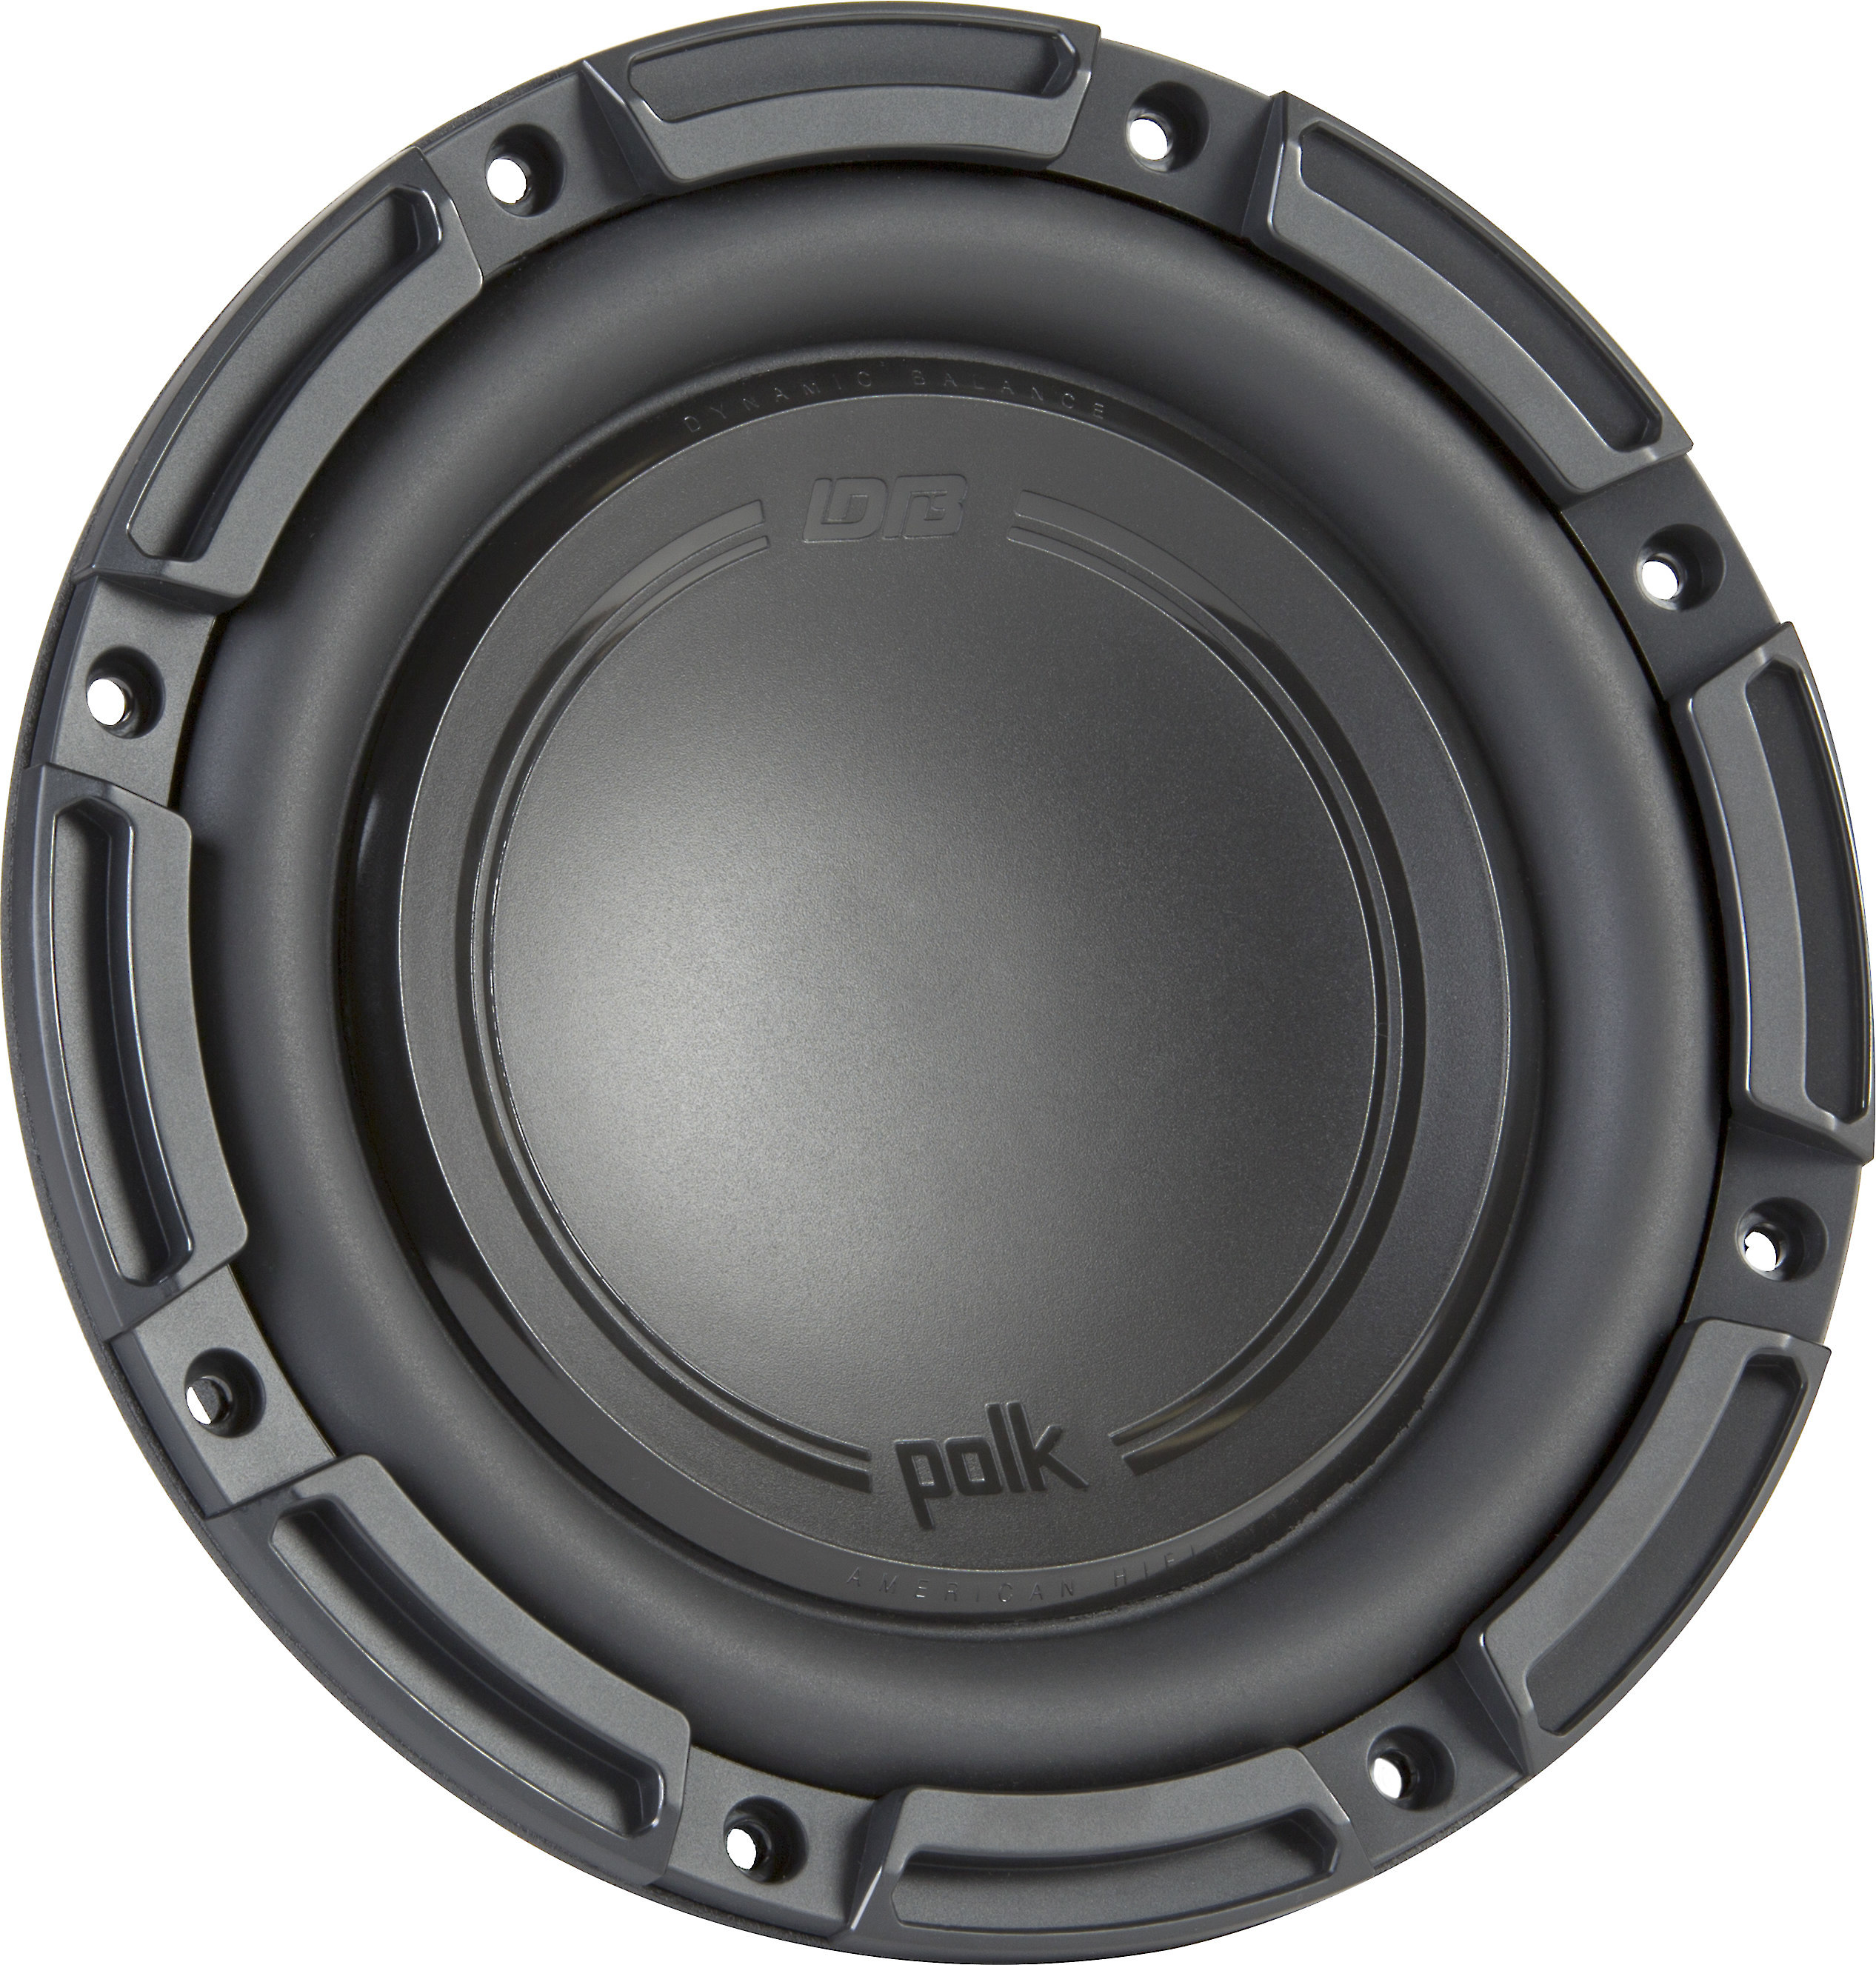 Polk Audio Car Subwoofer Wiring Kits - Wiring Diagram Review on